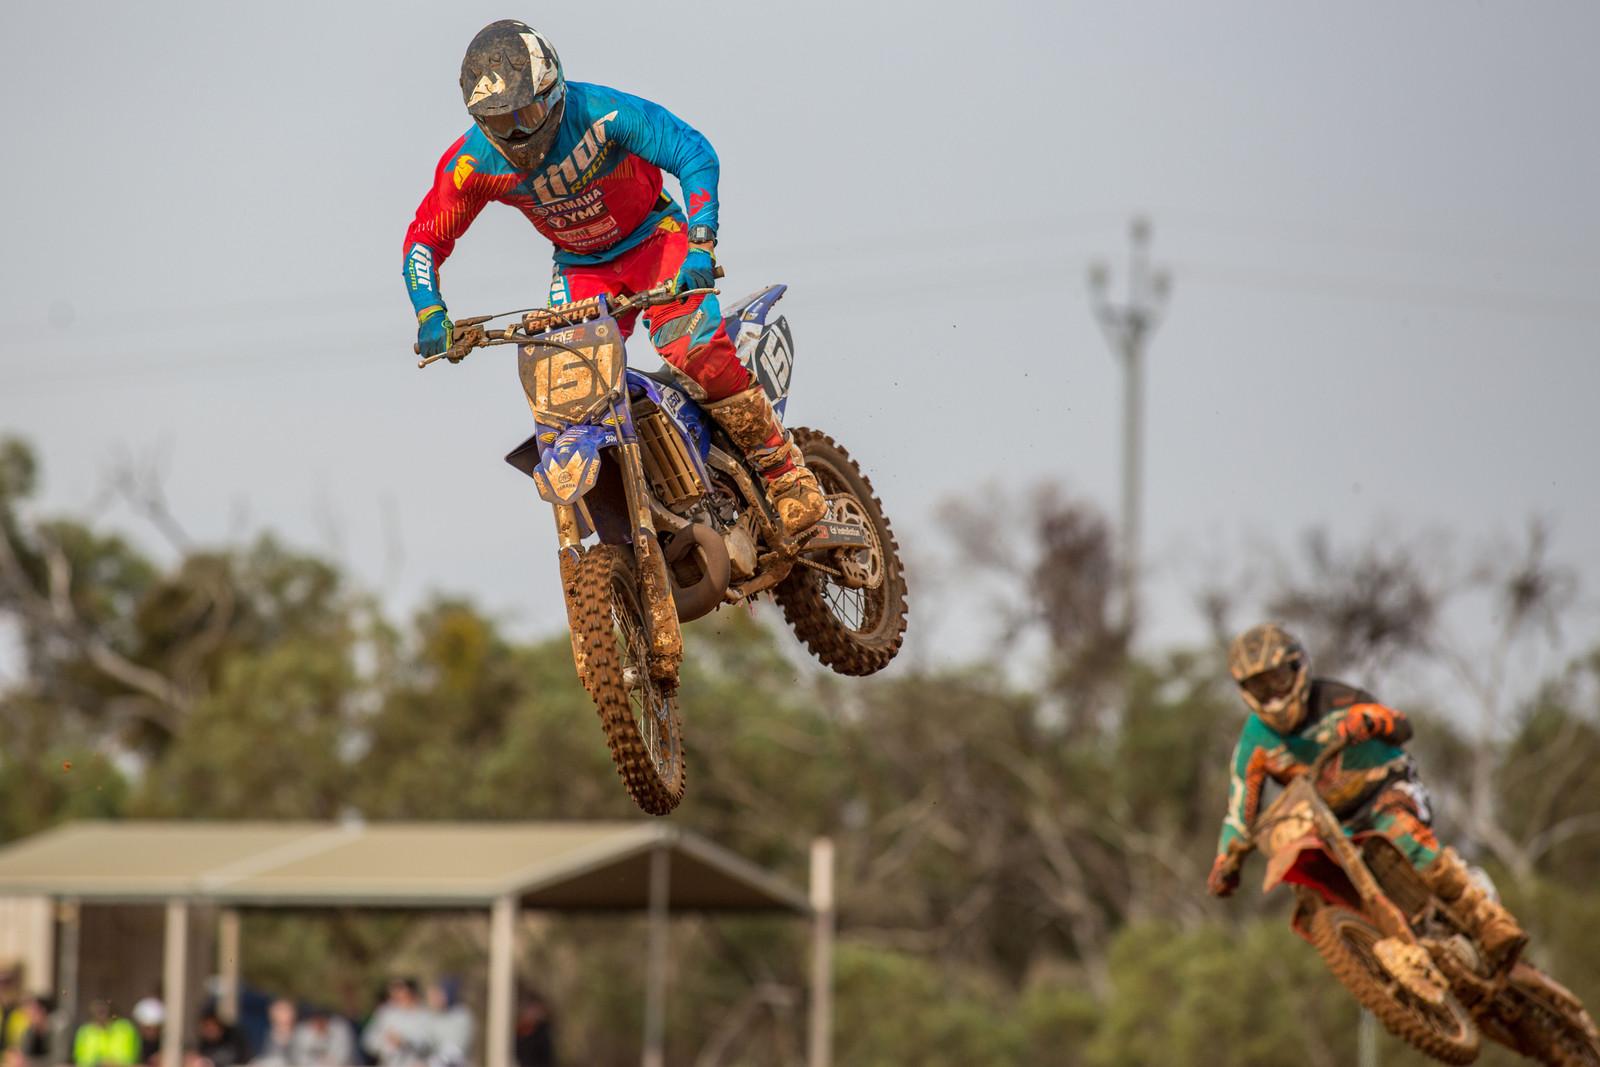 Nick Sutherland - Australian Motul Mx Championships: Round 4, Murray Bridge - Motocross Pictures - Vital MX